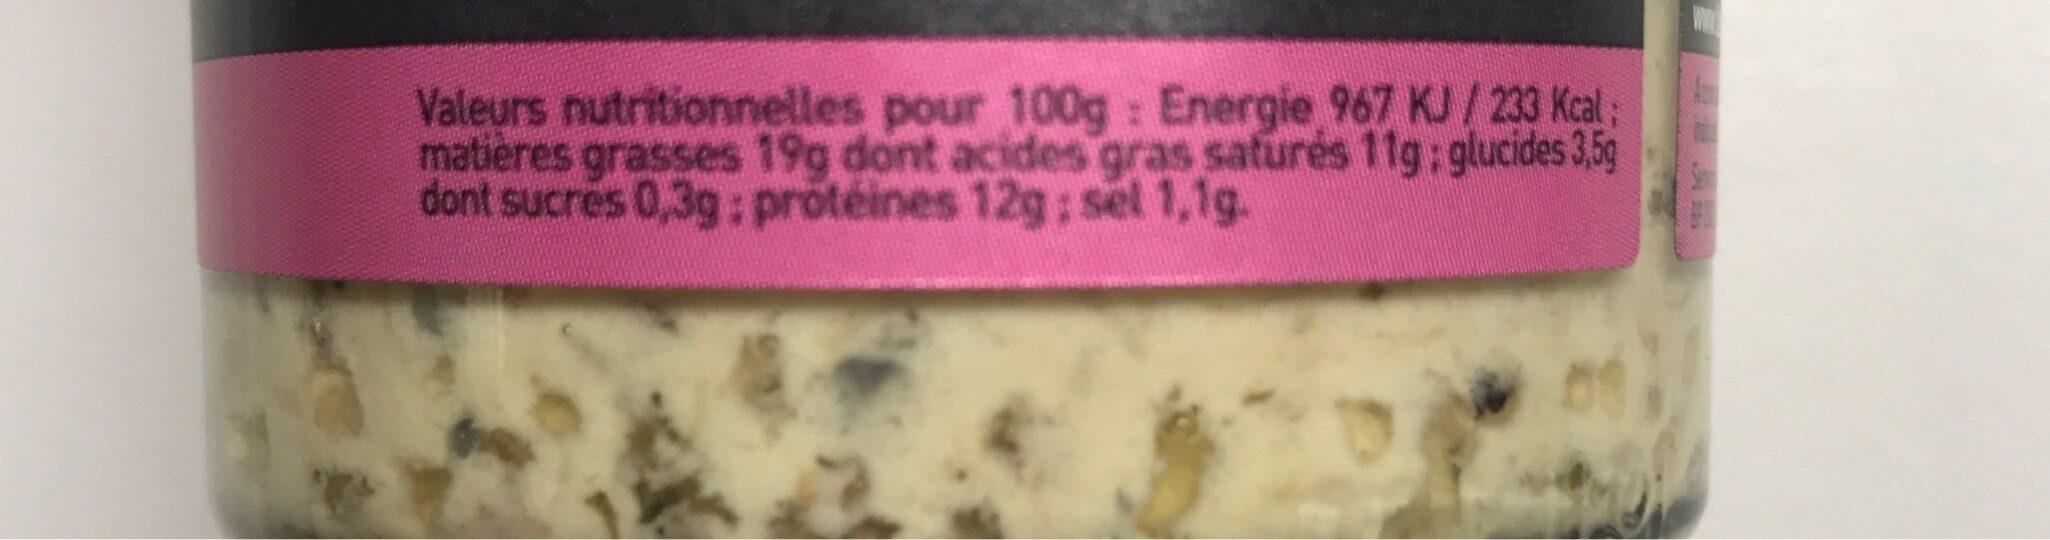 Daurade grise au gingembre - Informations nutritionnelles - fr